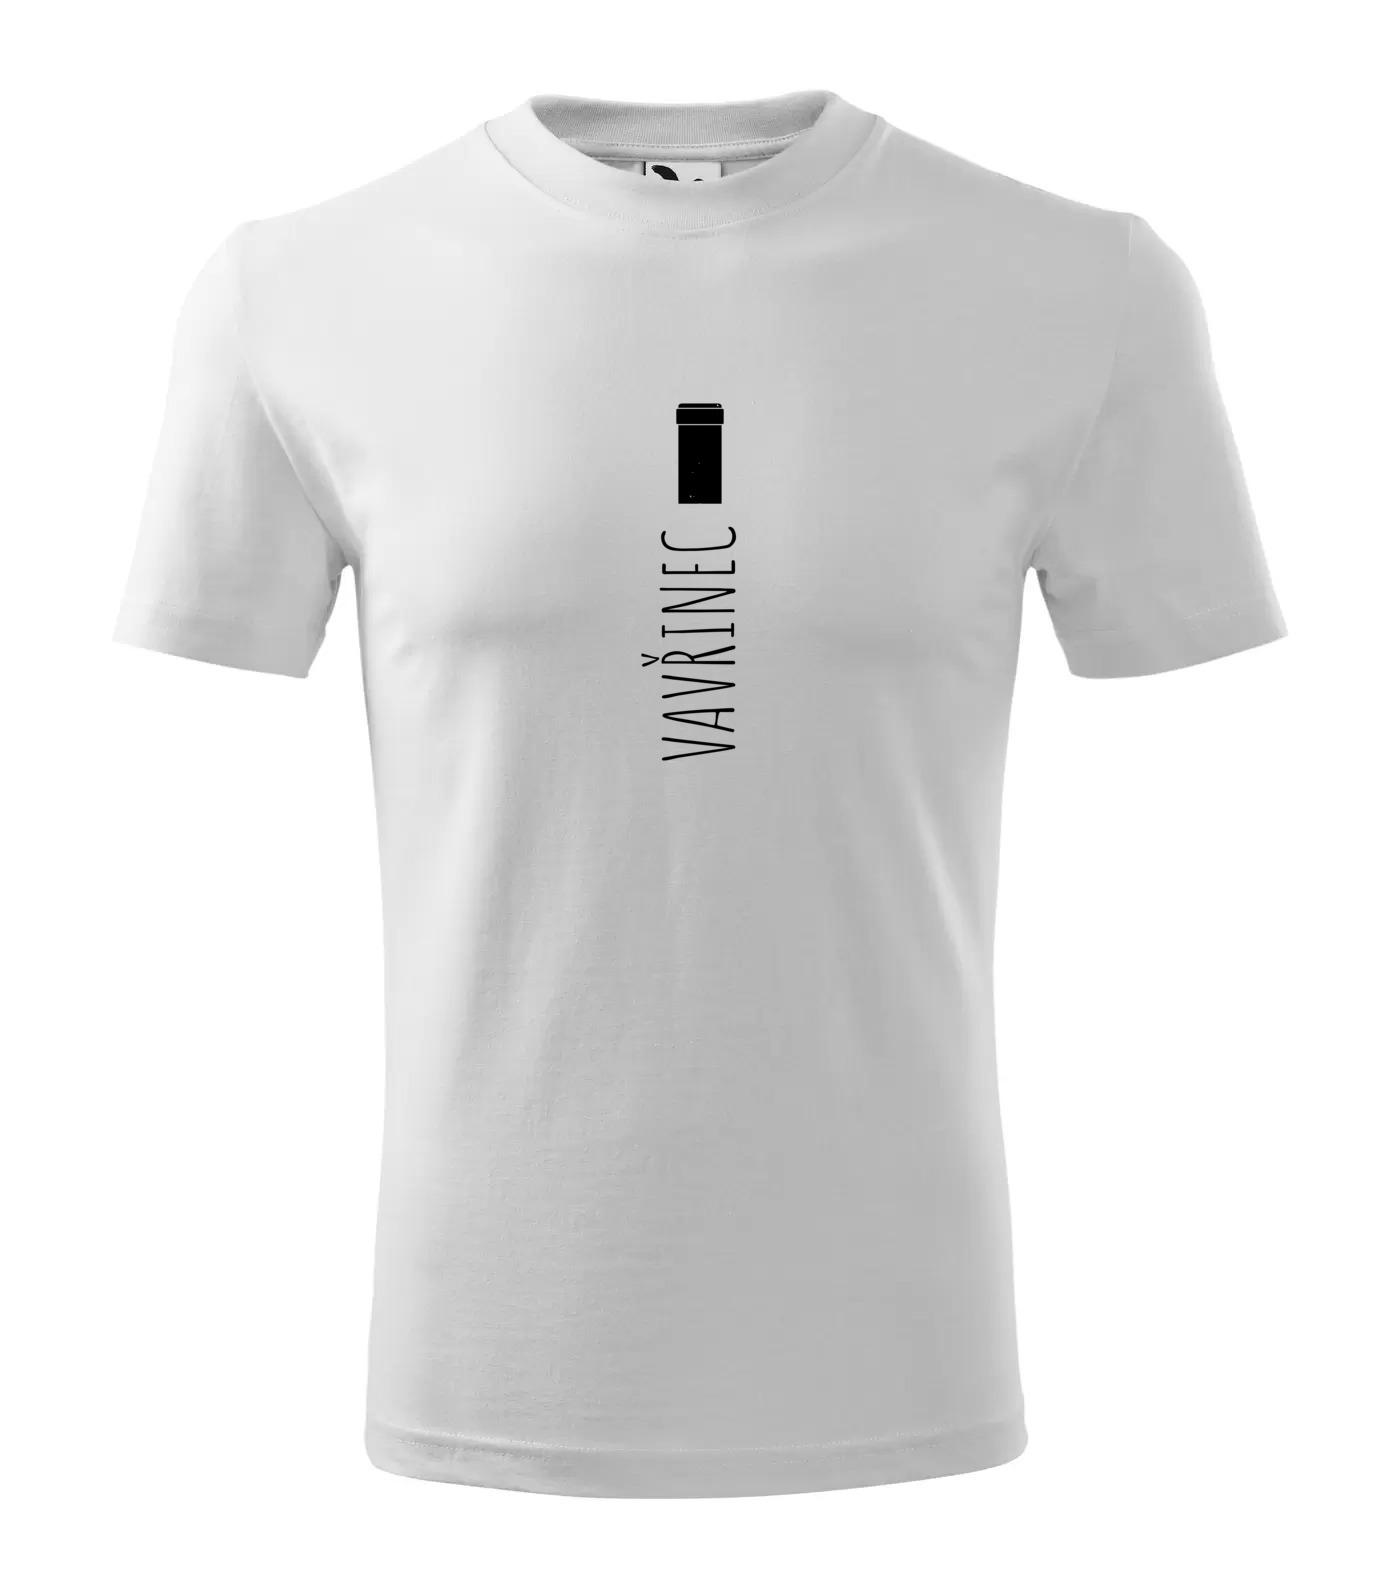 Tričko Vavřinec